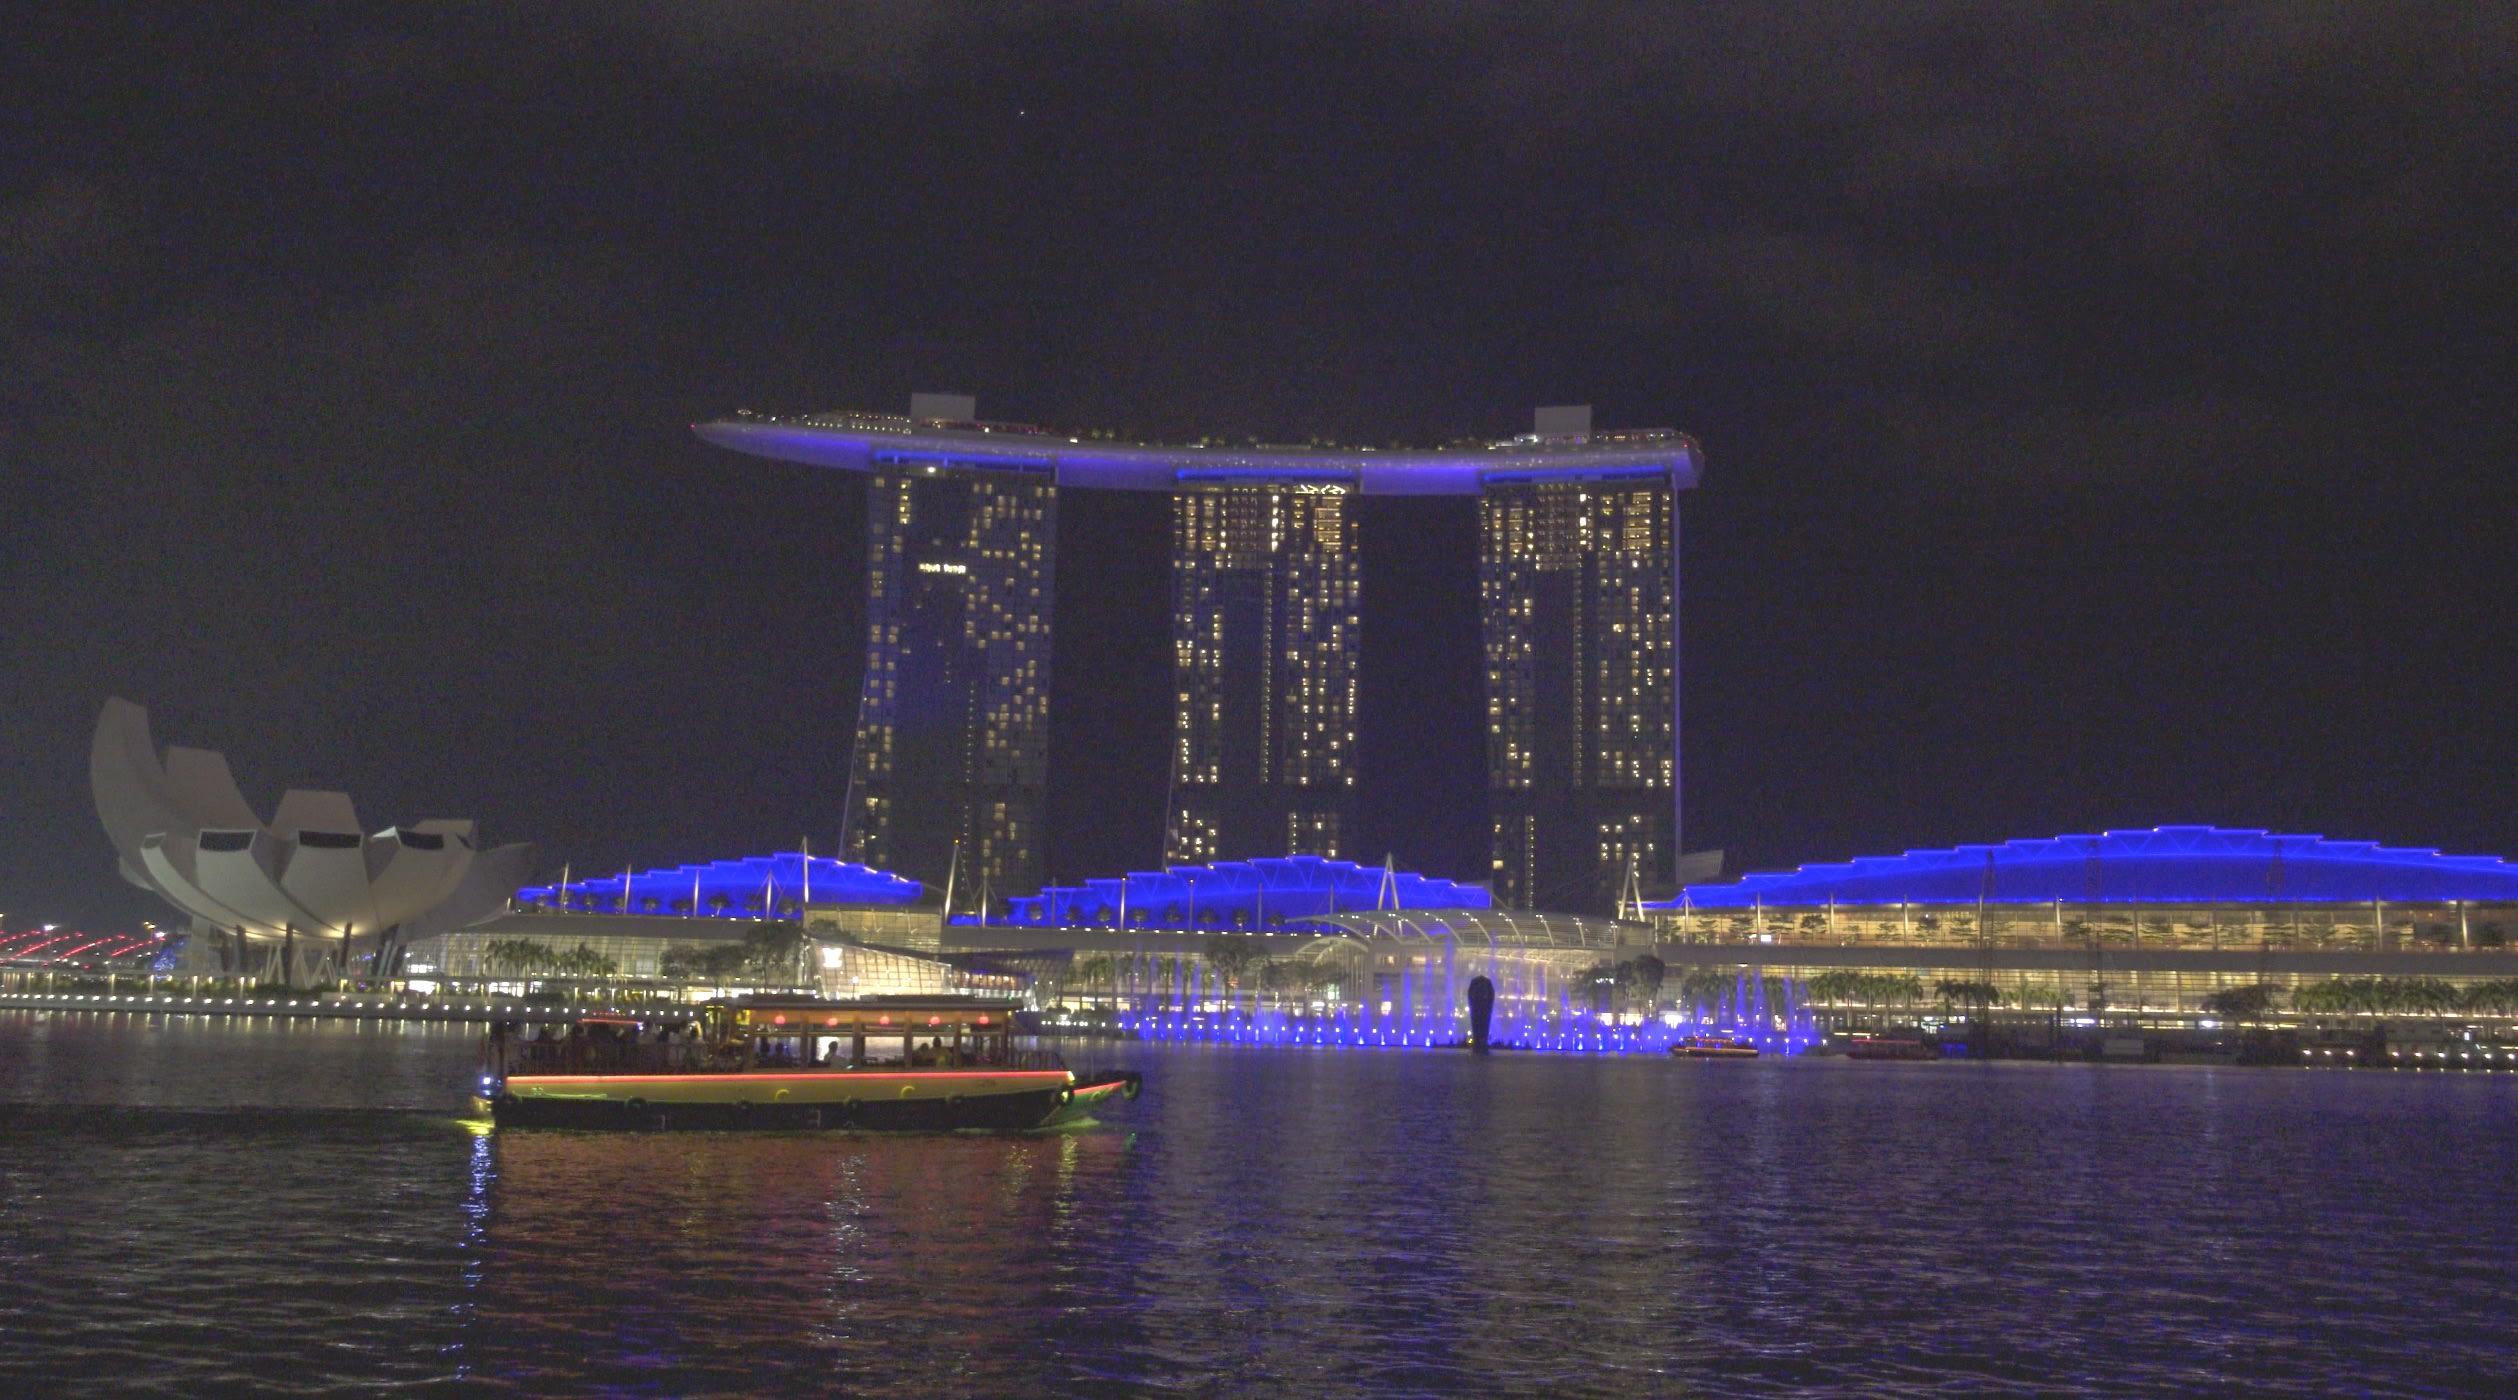 klook singapore gabbi garcia issa pressman singapore river cruise